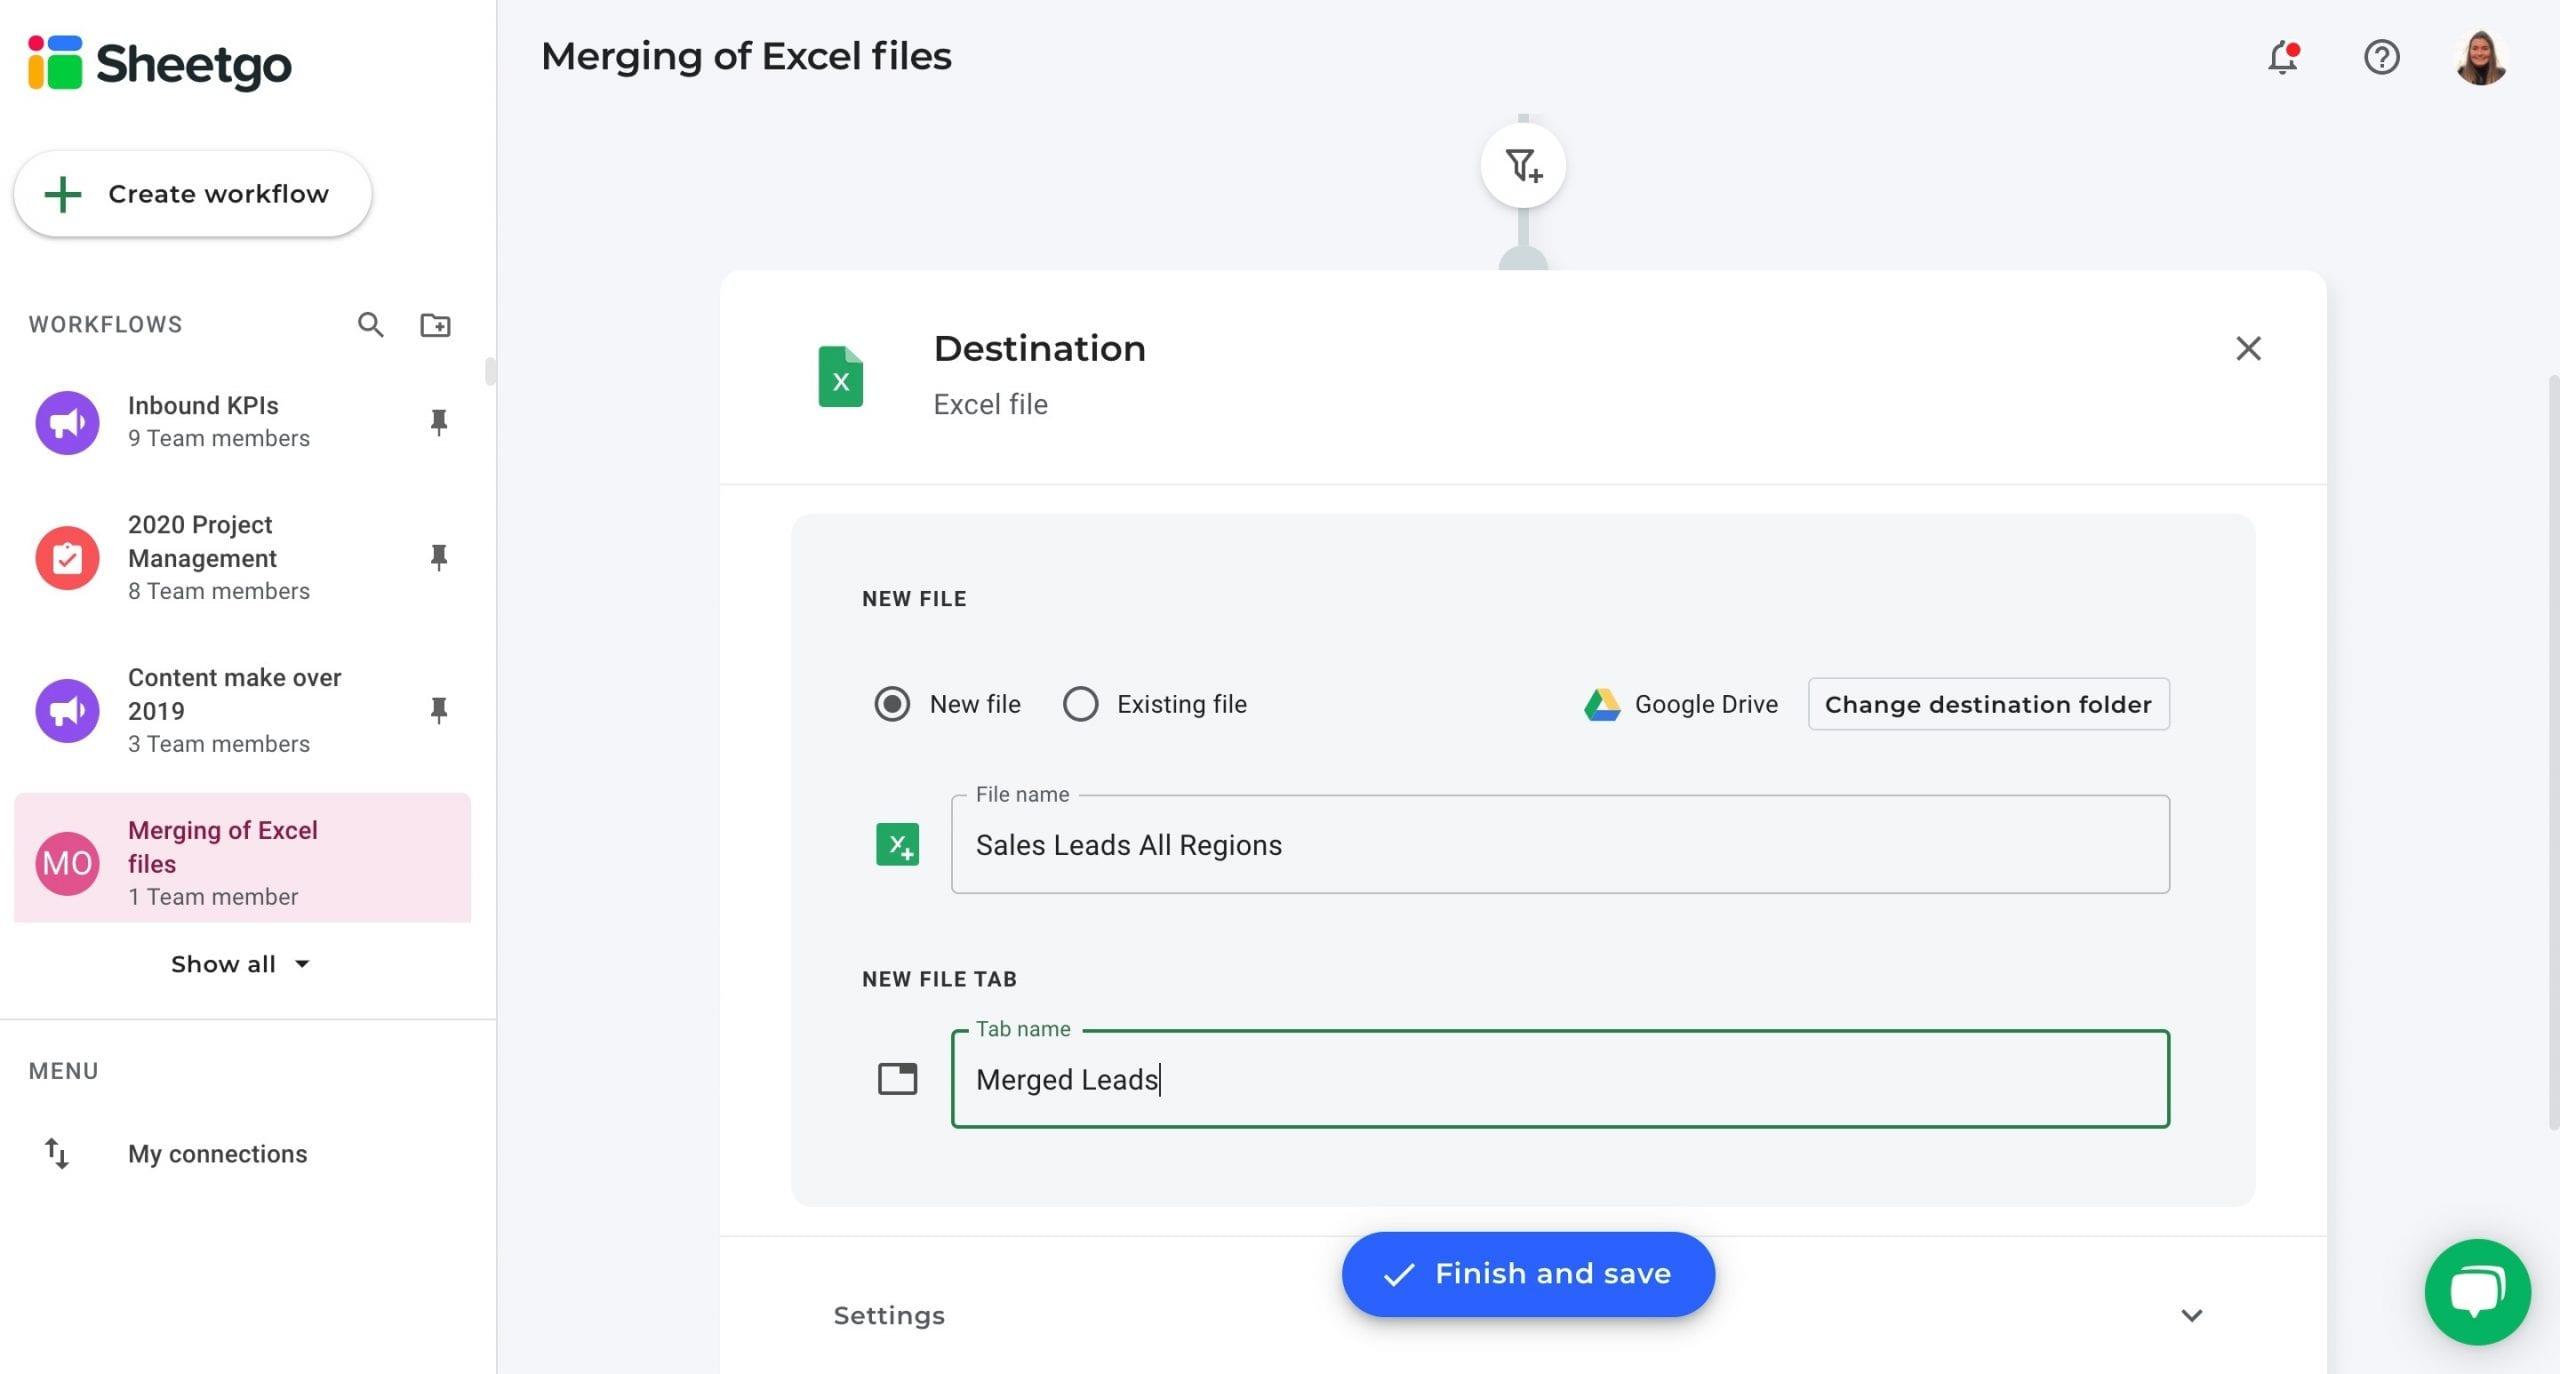 Merging Of Excel Files Combine Multiple Worksheets